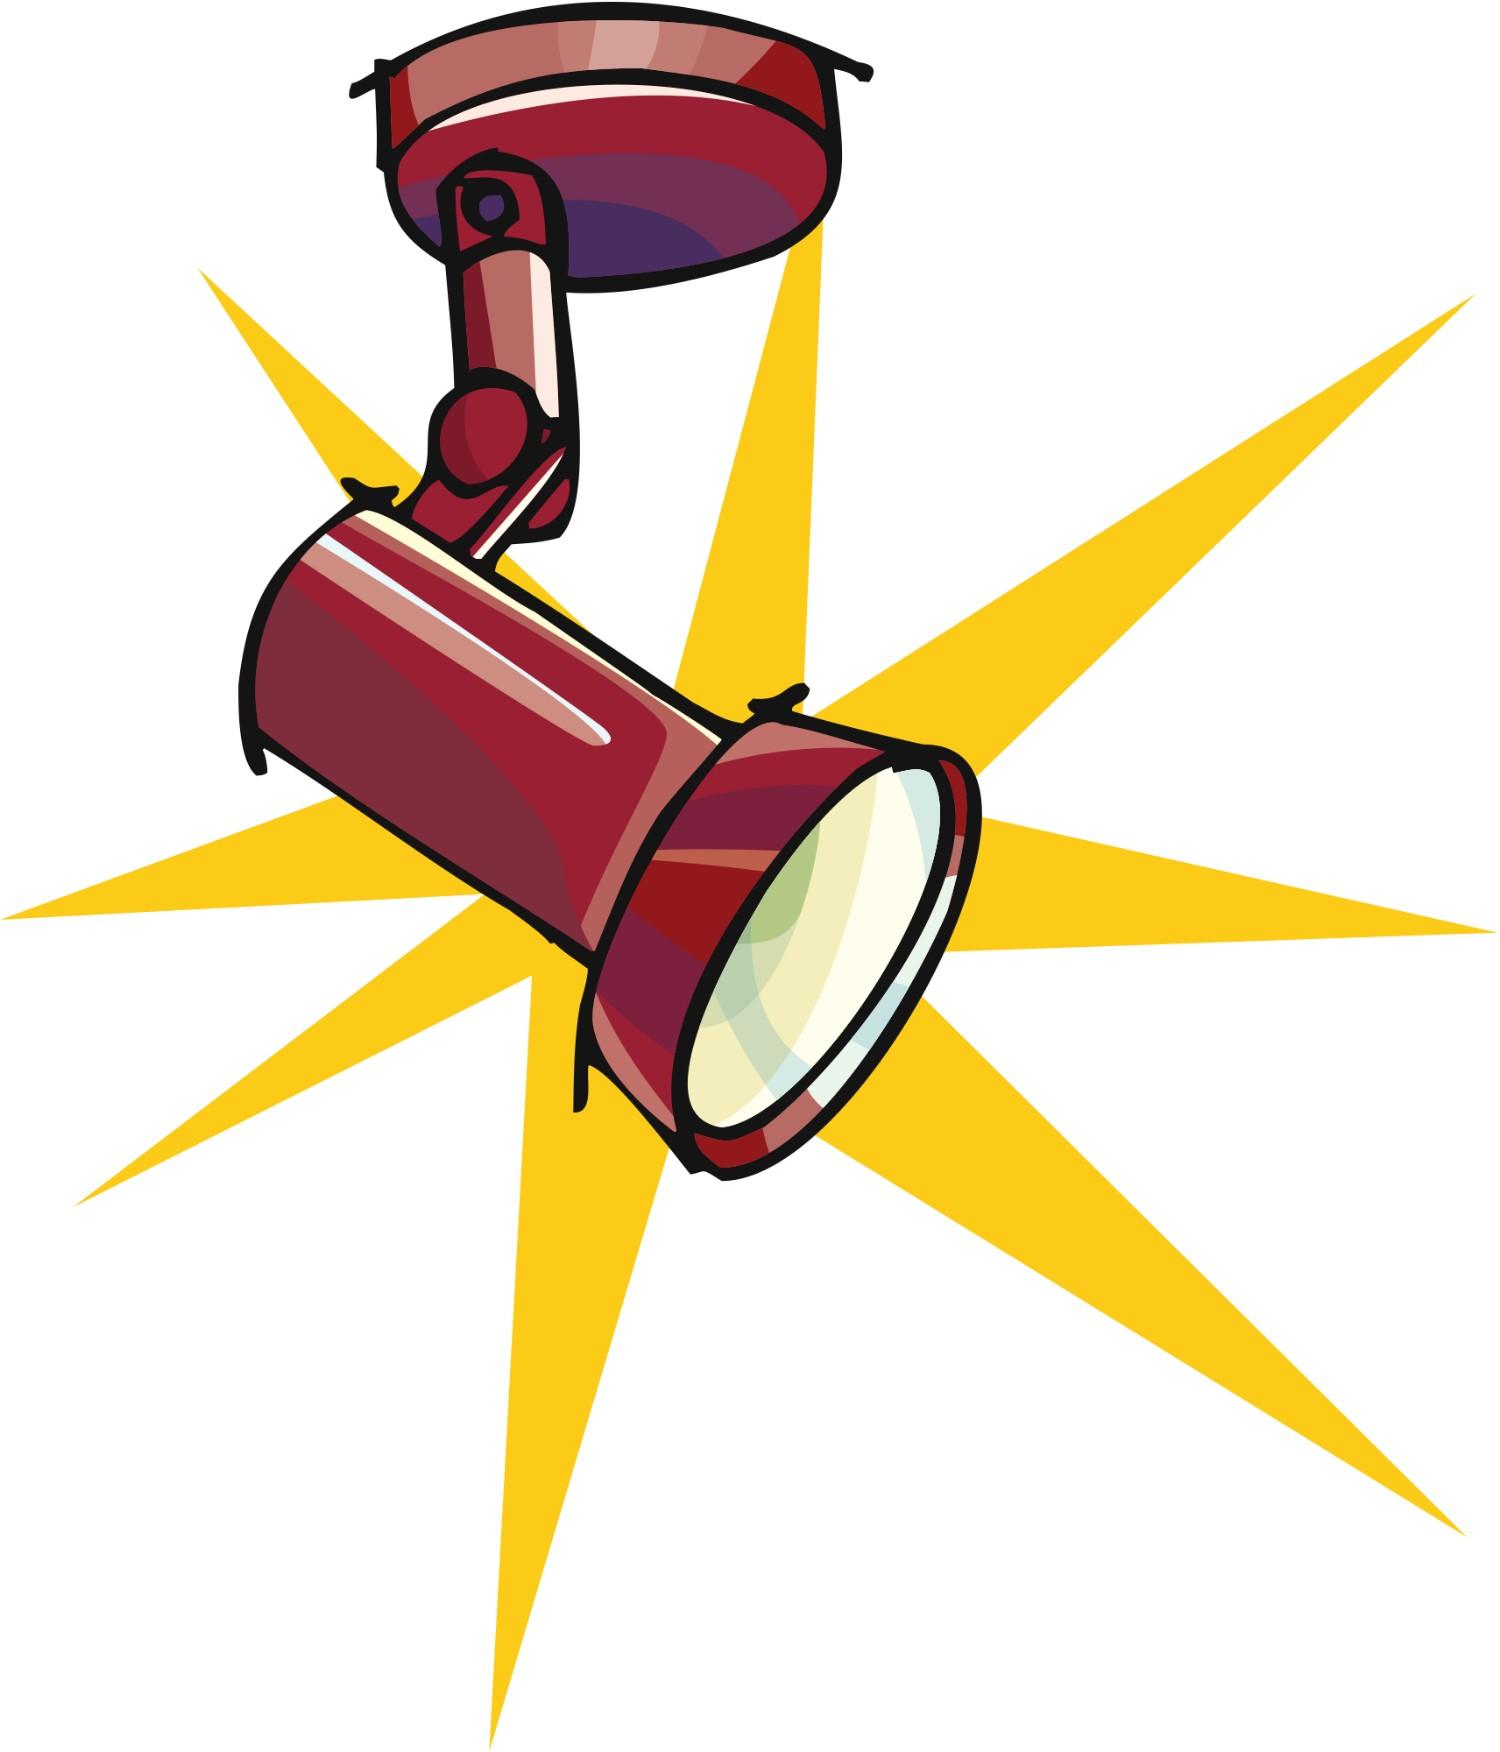 Spotlight clip art free clipart images 5